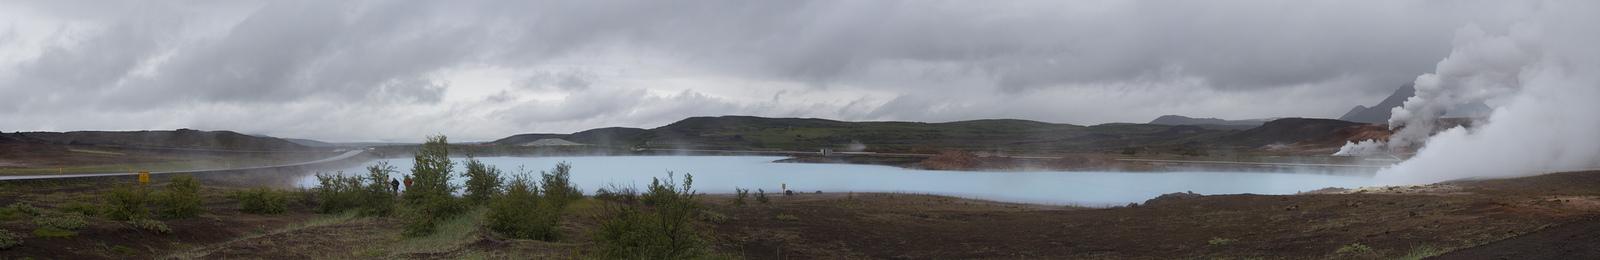 Myvatn lagoon near powerplant